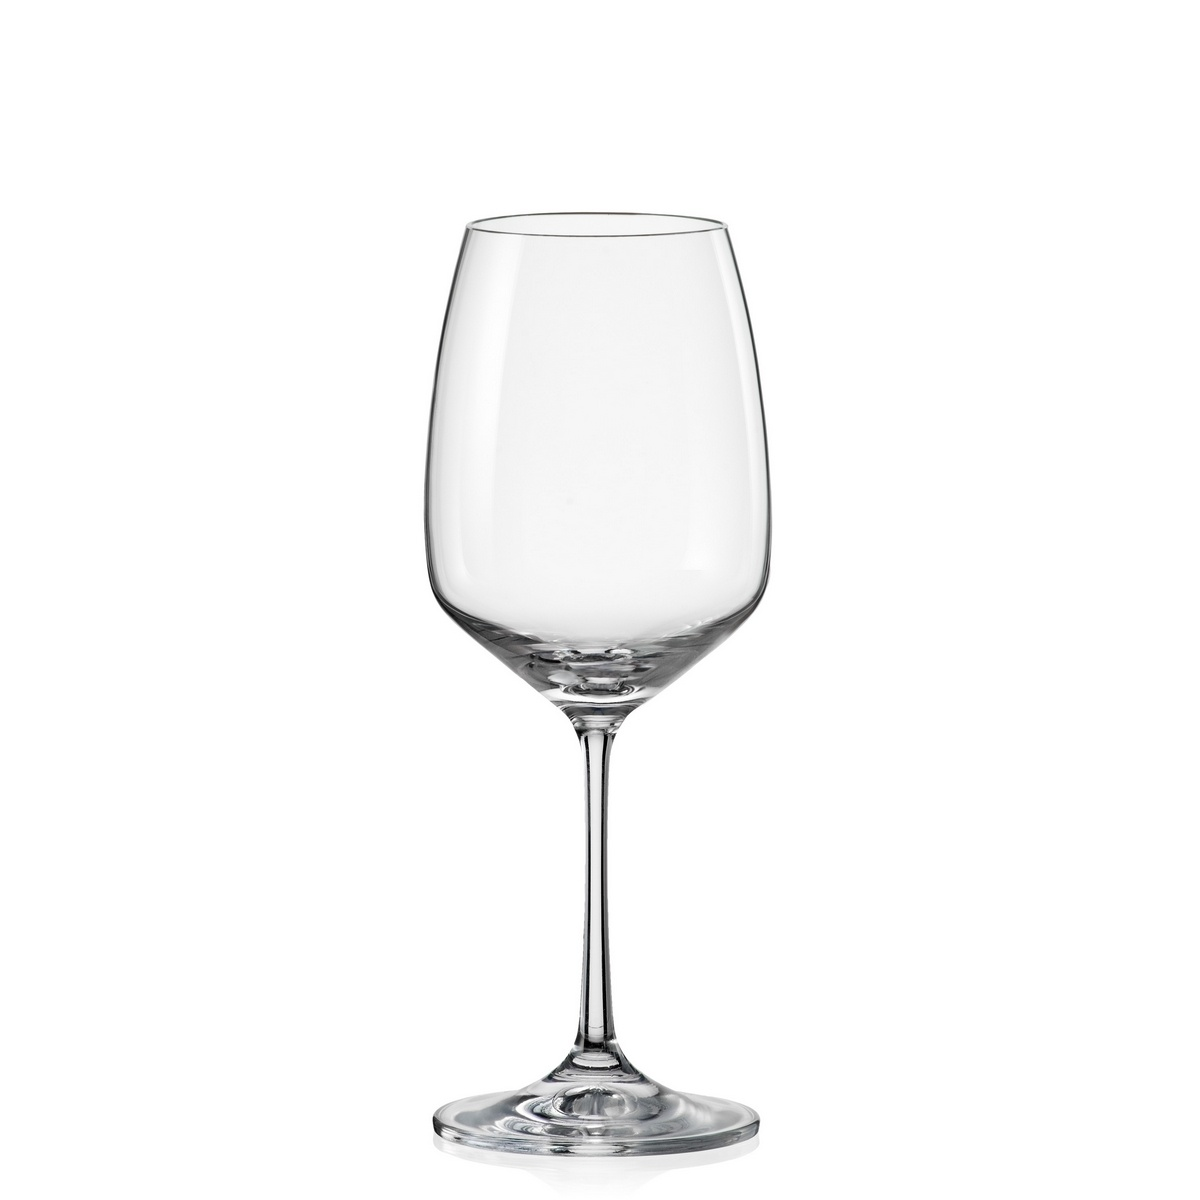 Crystalex 6dílná sada sklenic na víno GISELLE, 455 ml